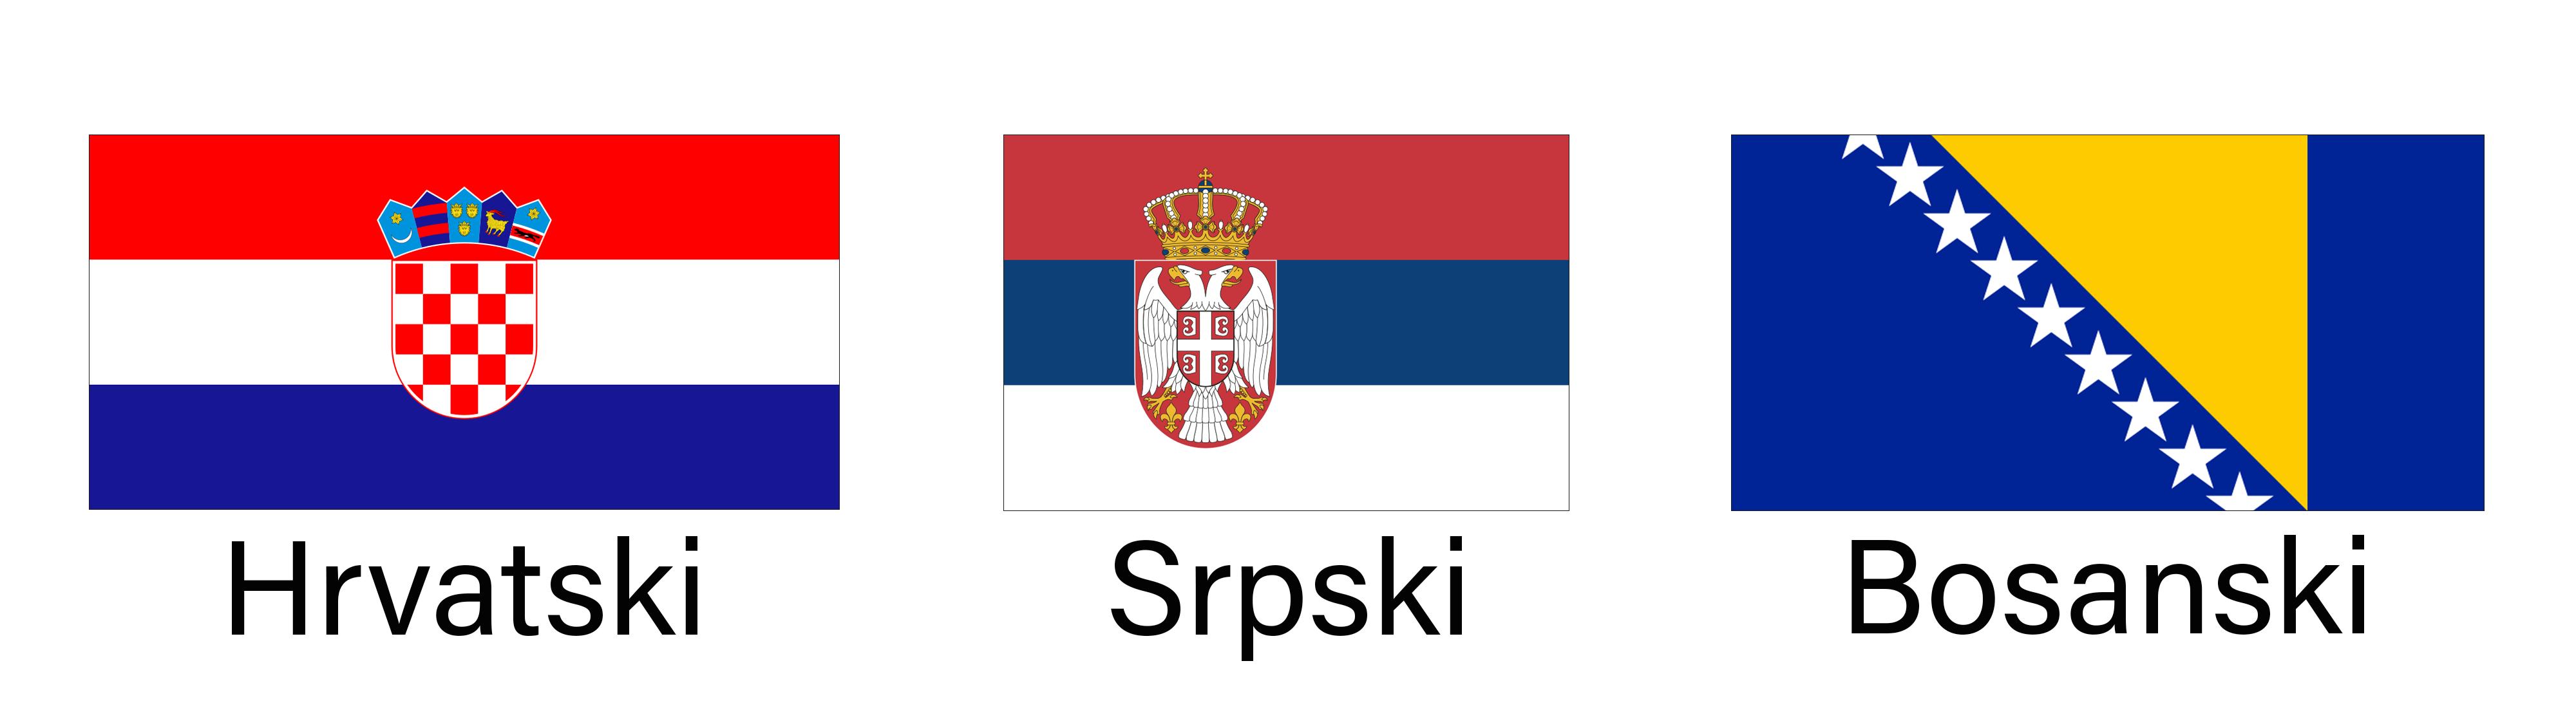 Schuldnerberatung kroatisch serbisch bosnisch